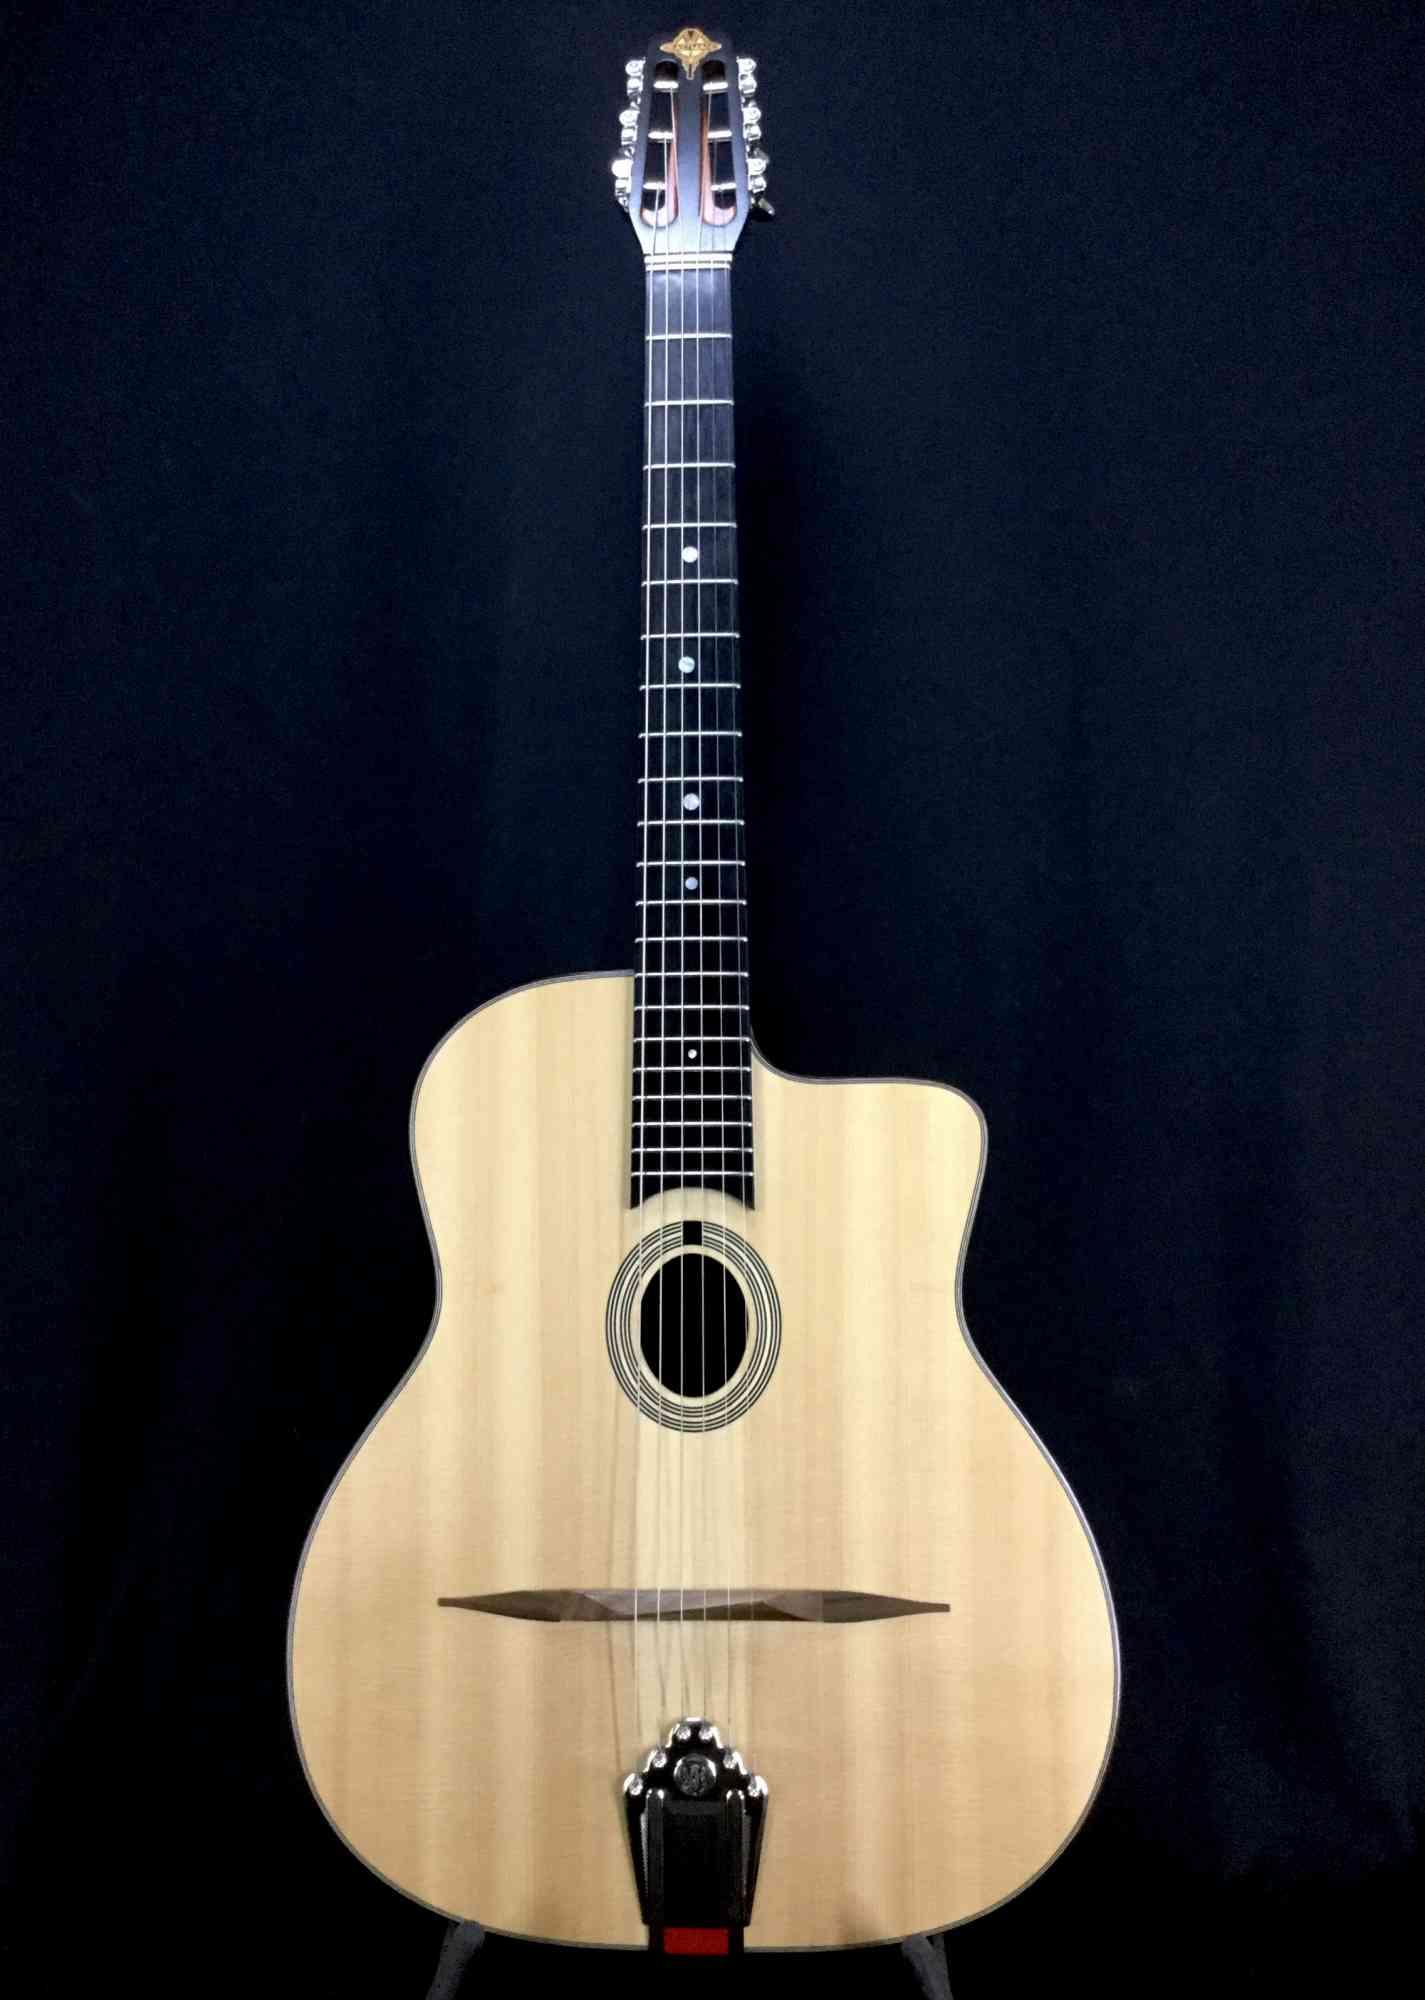 Eastman DM1 Gypsy Jazz Guitar 2020 . Click to enlarge